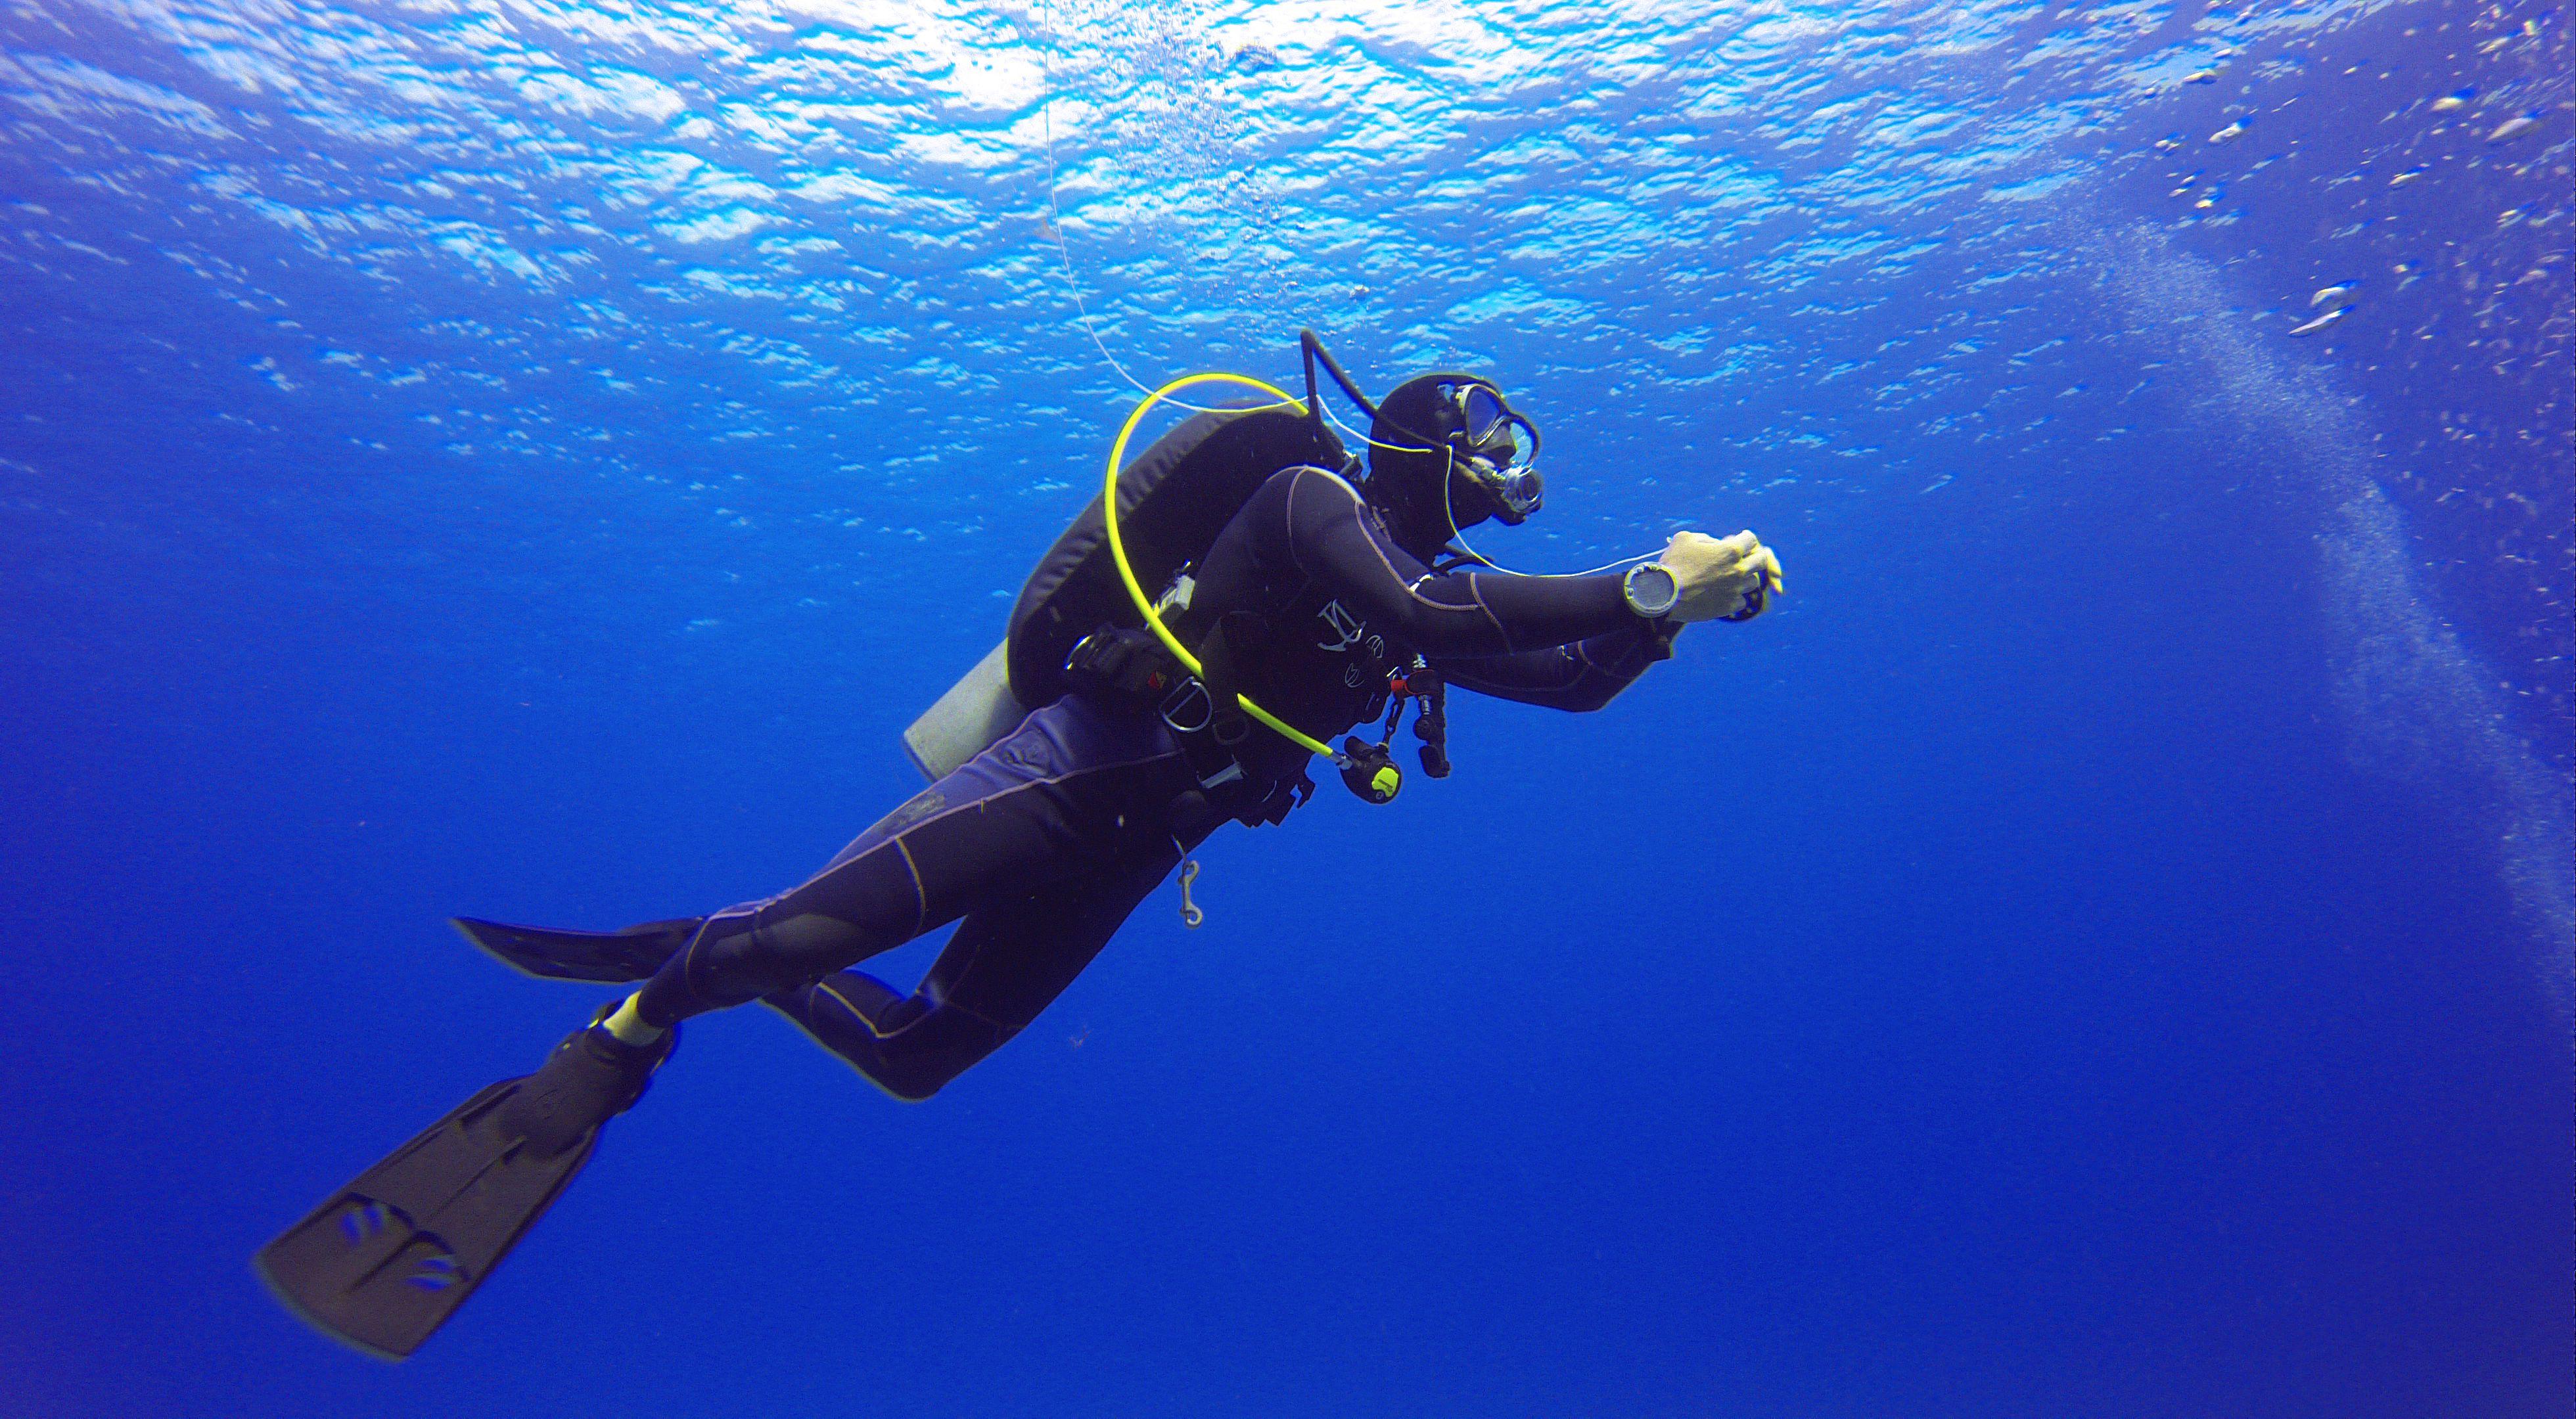 Scuba diver near the surface.